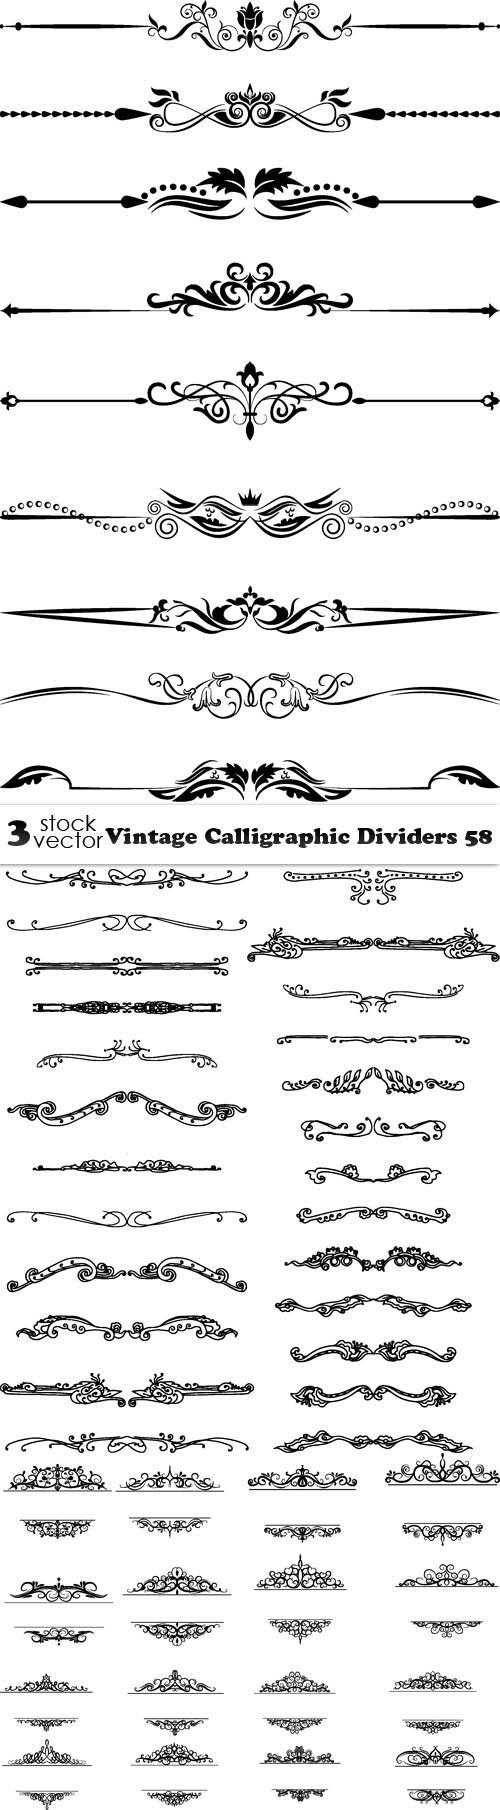 Vectors - Vintage Calligraphic Dividers 58